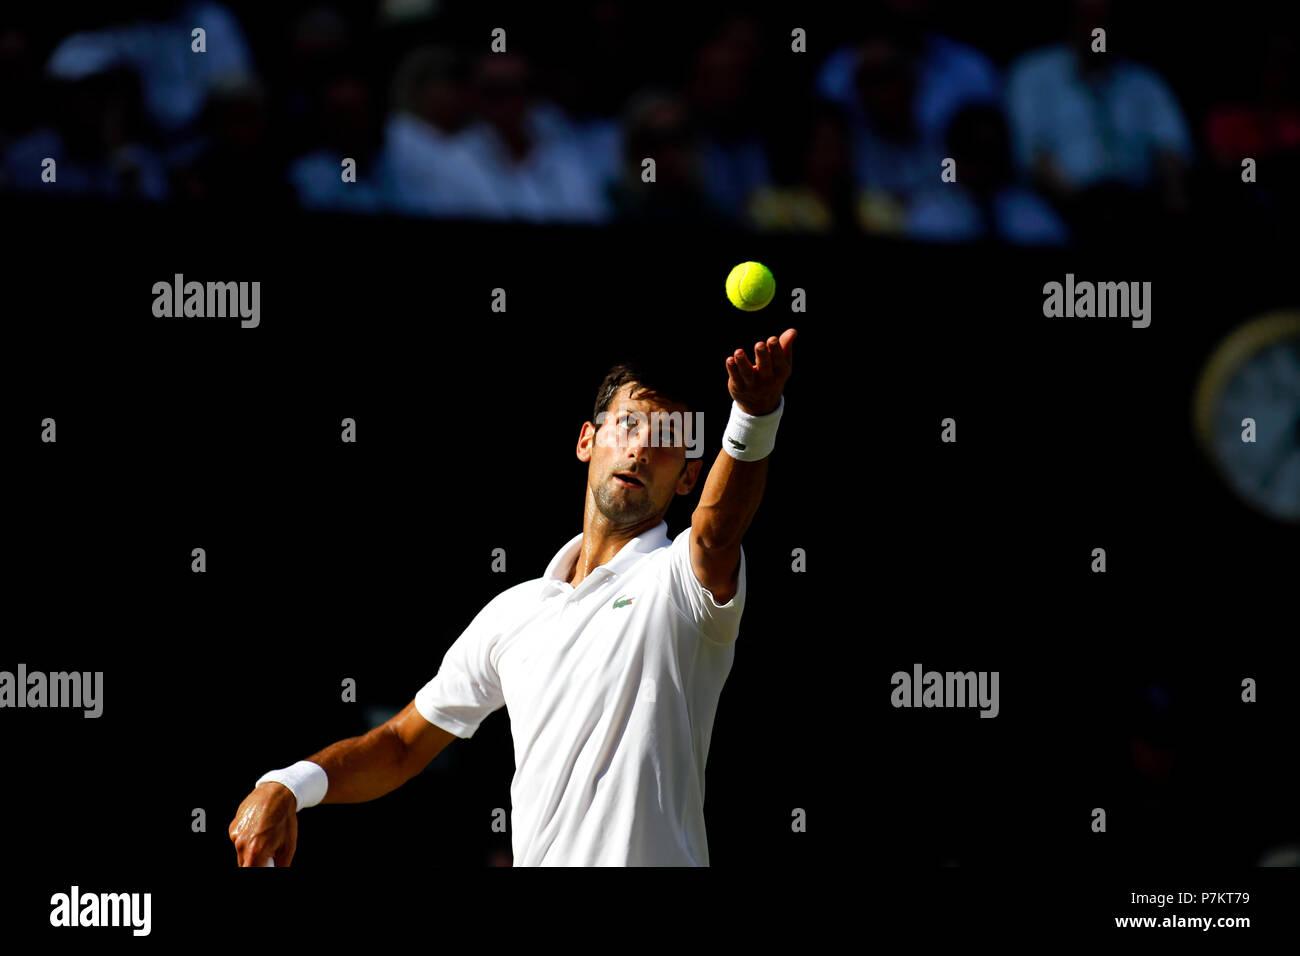 London, UK. 7th July 2018.   Wimbledon Tennis: Novak Djokovic during his third round match against Great Britain's Kyle Edmund on Center Court at Wimbledon today. Credit: Adam Stoltman/Alamy Live News - Stock Image